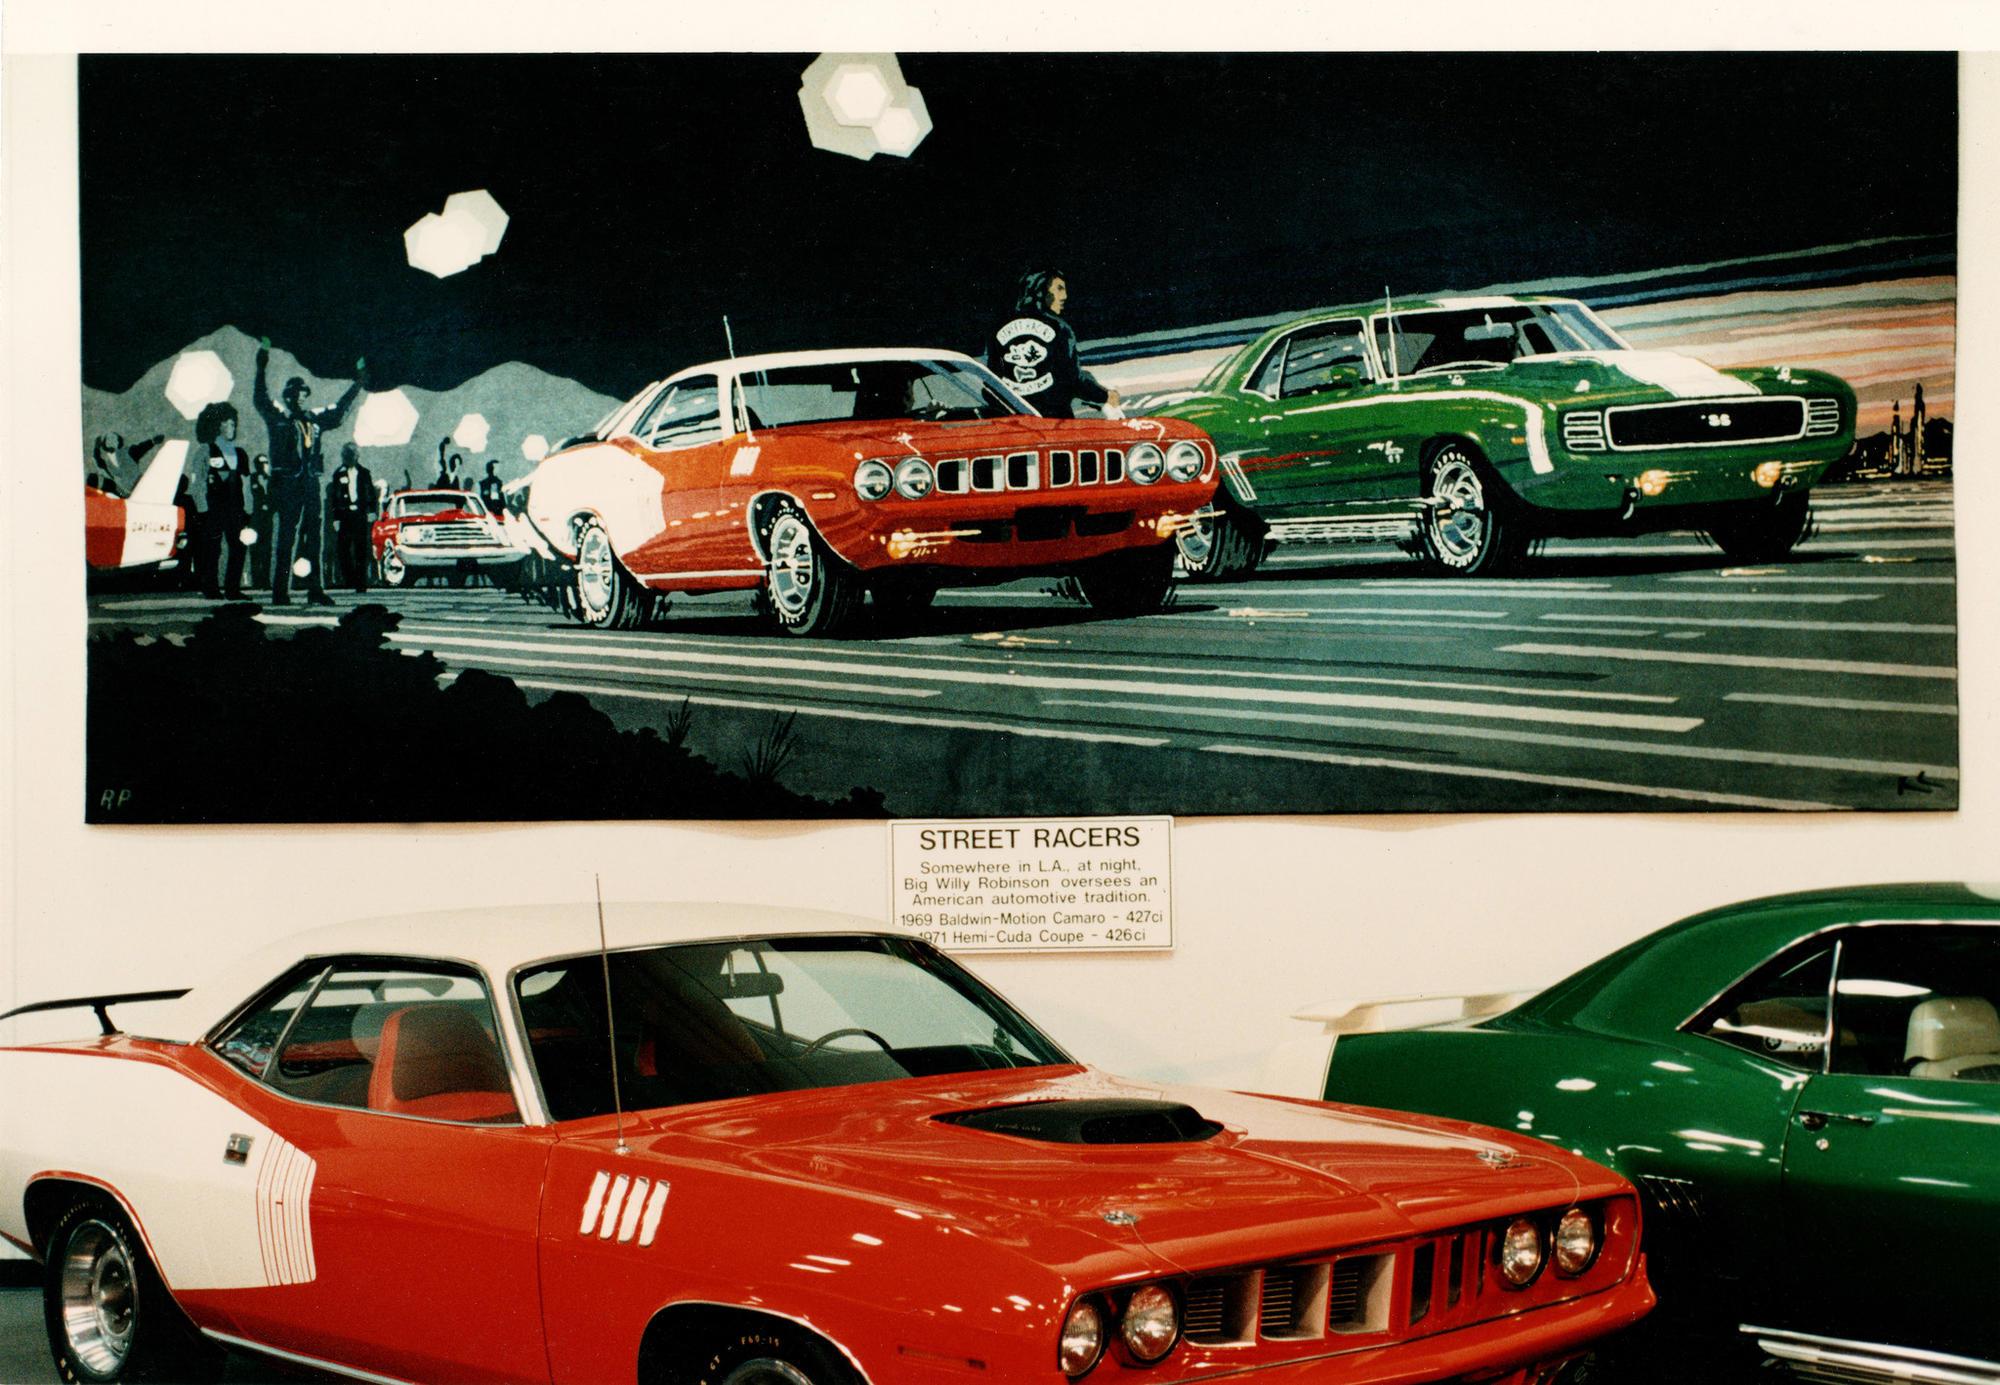 'Street Racers' tapestry